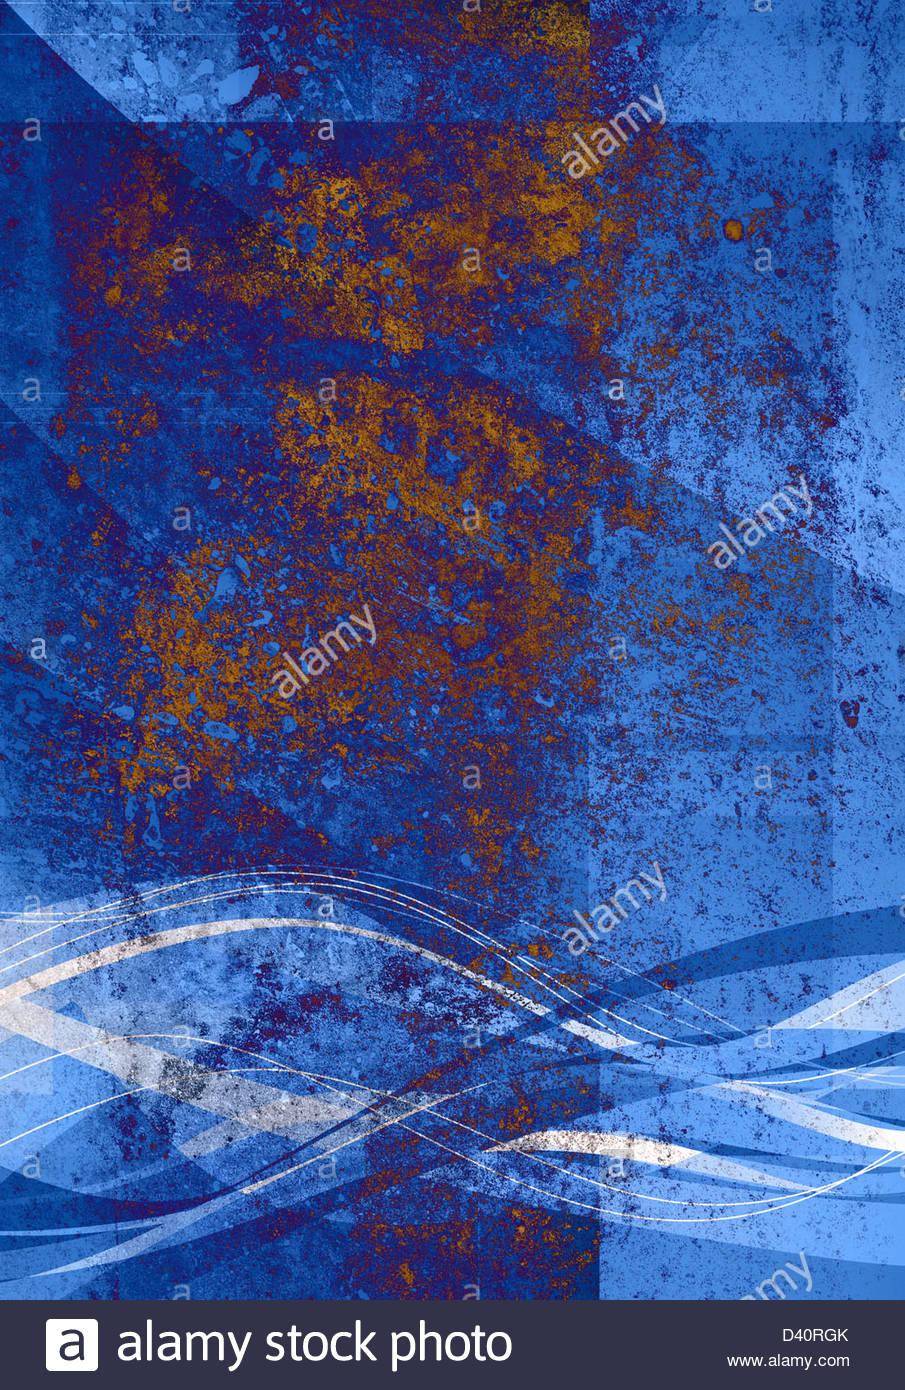 Grunge texture background Photo Stock